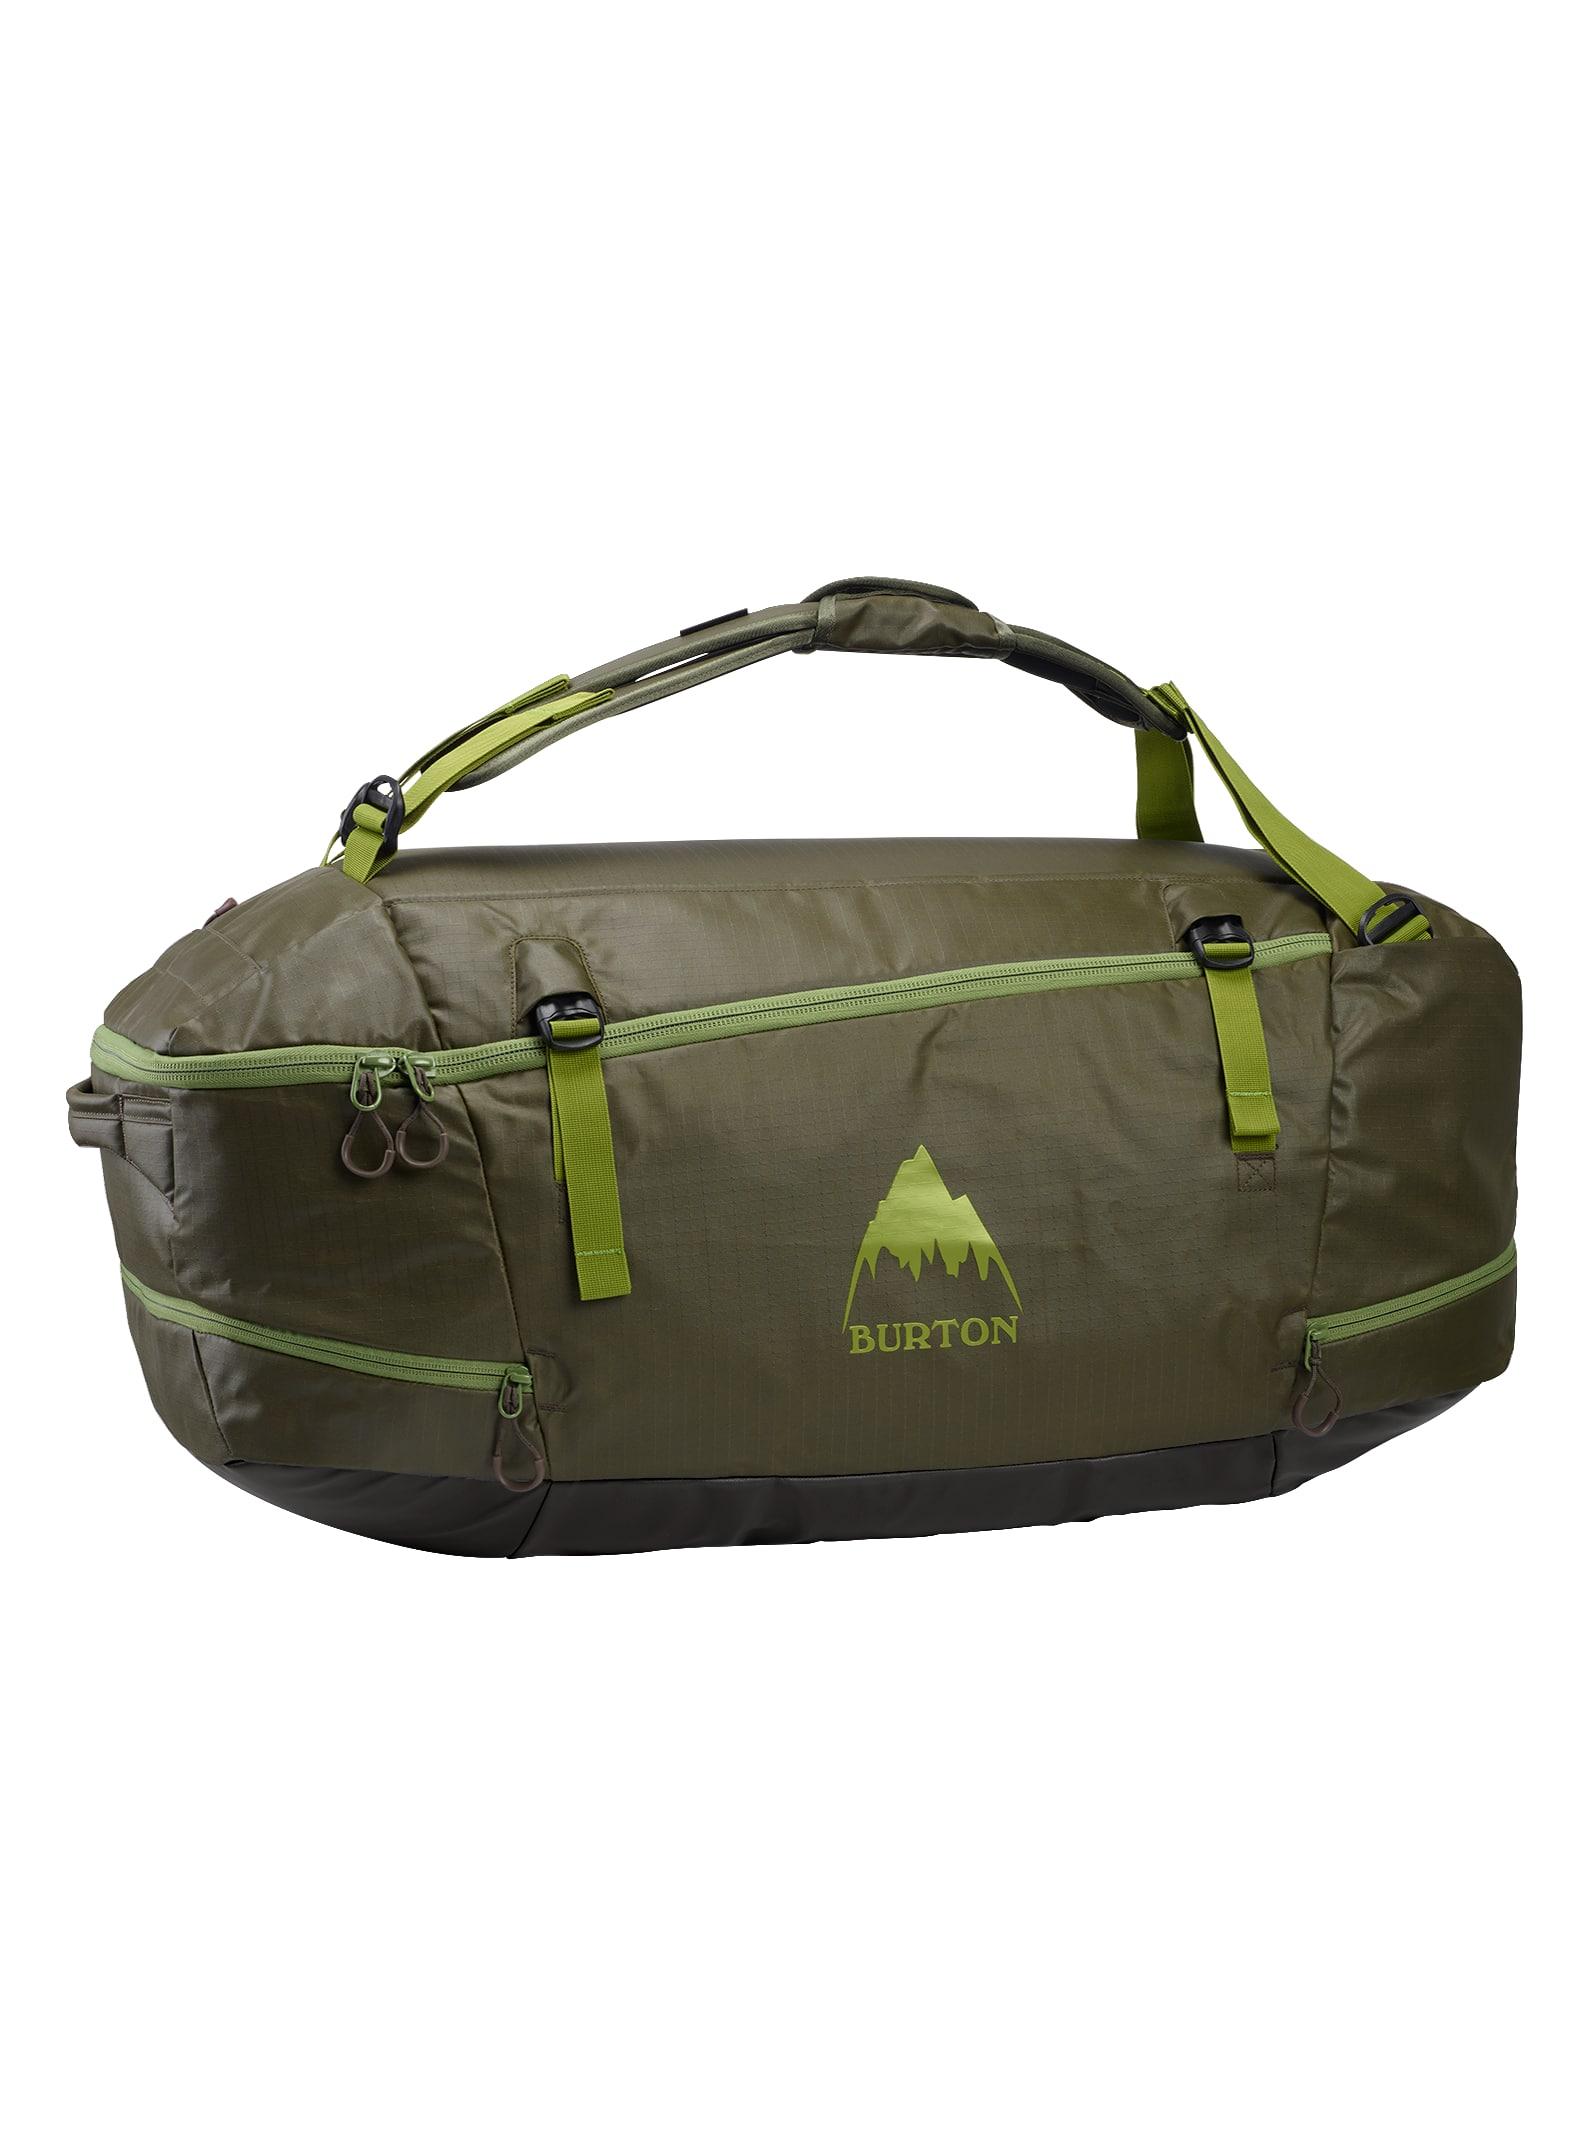 Bags  1b3dcf6ec9ca0